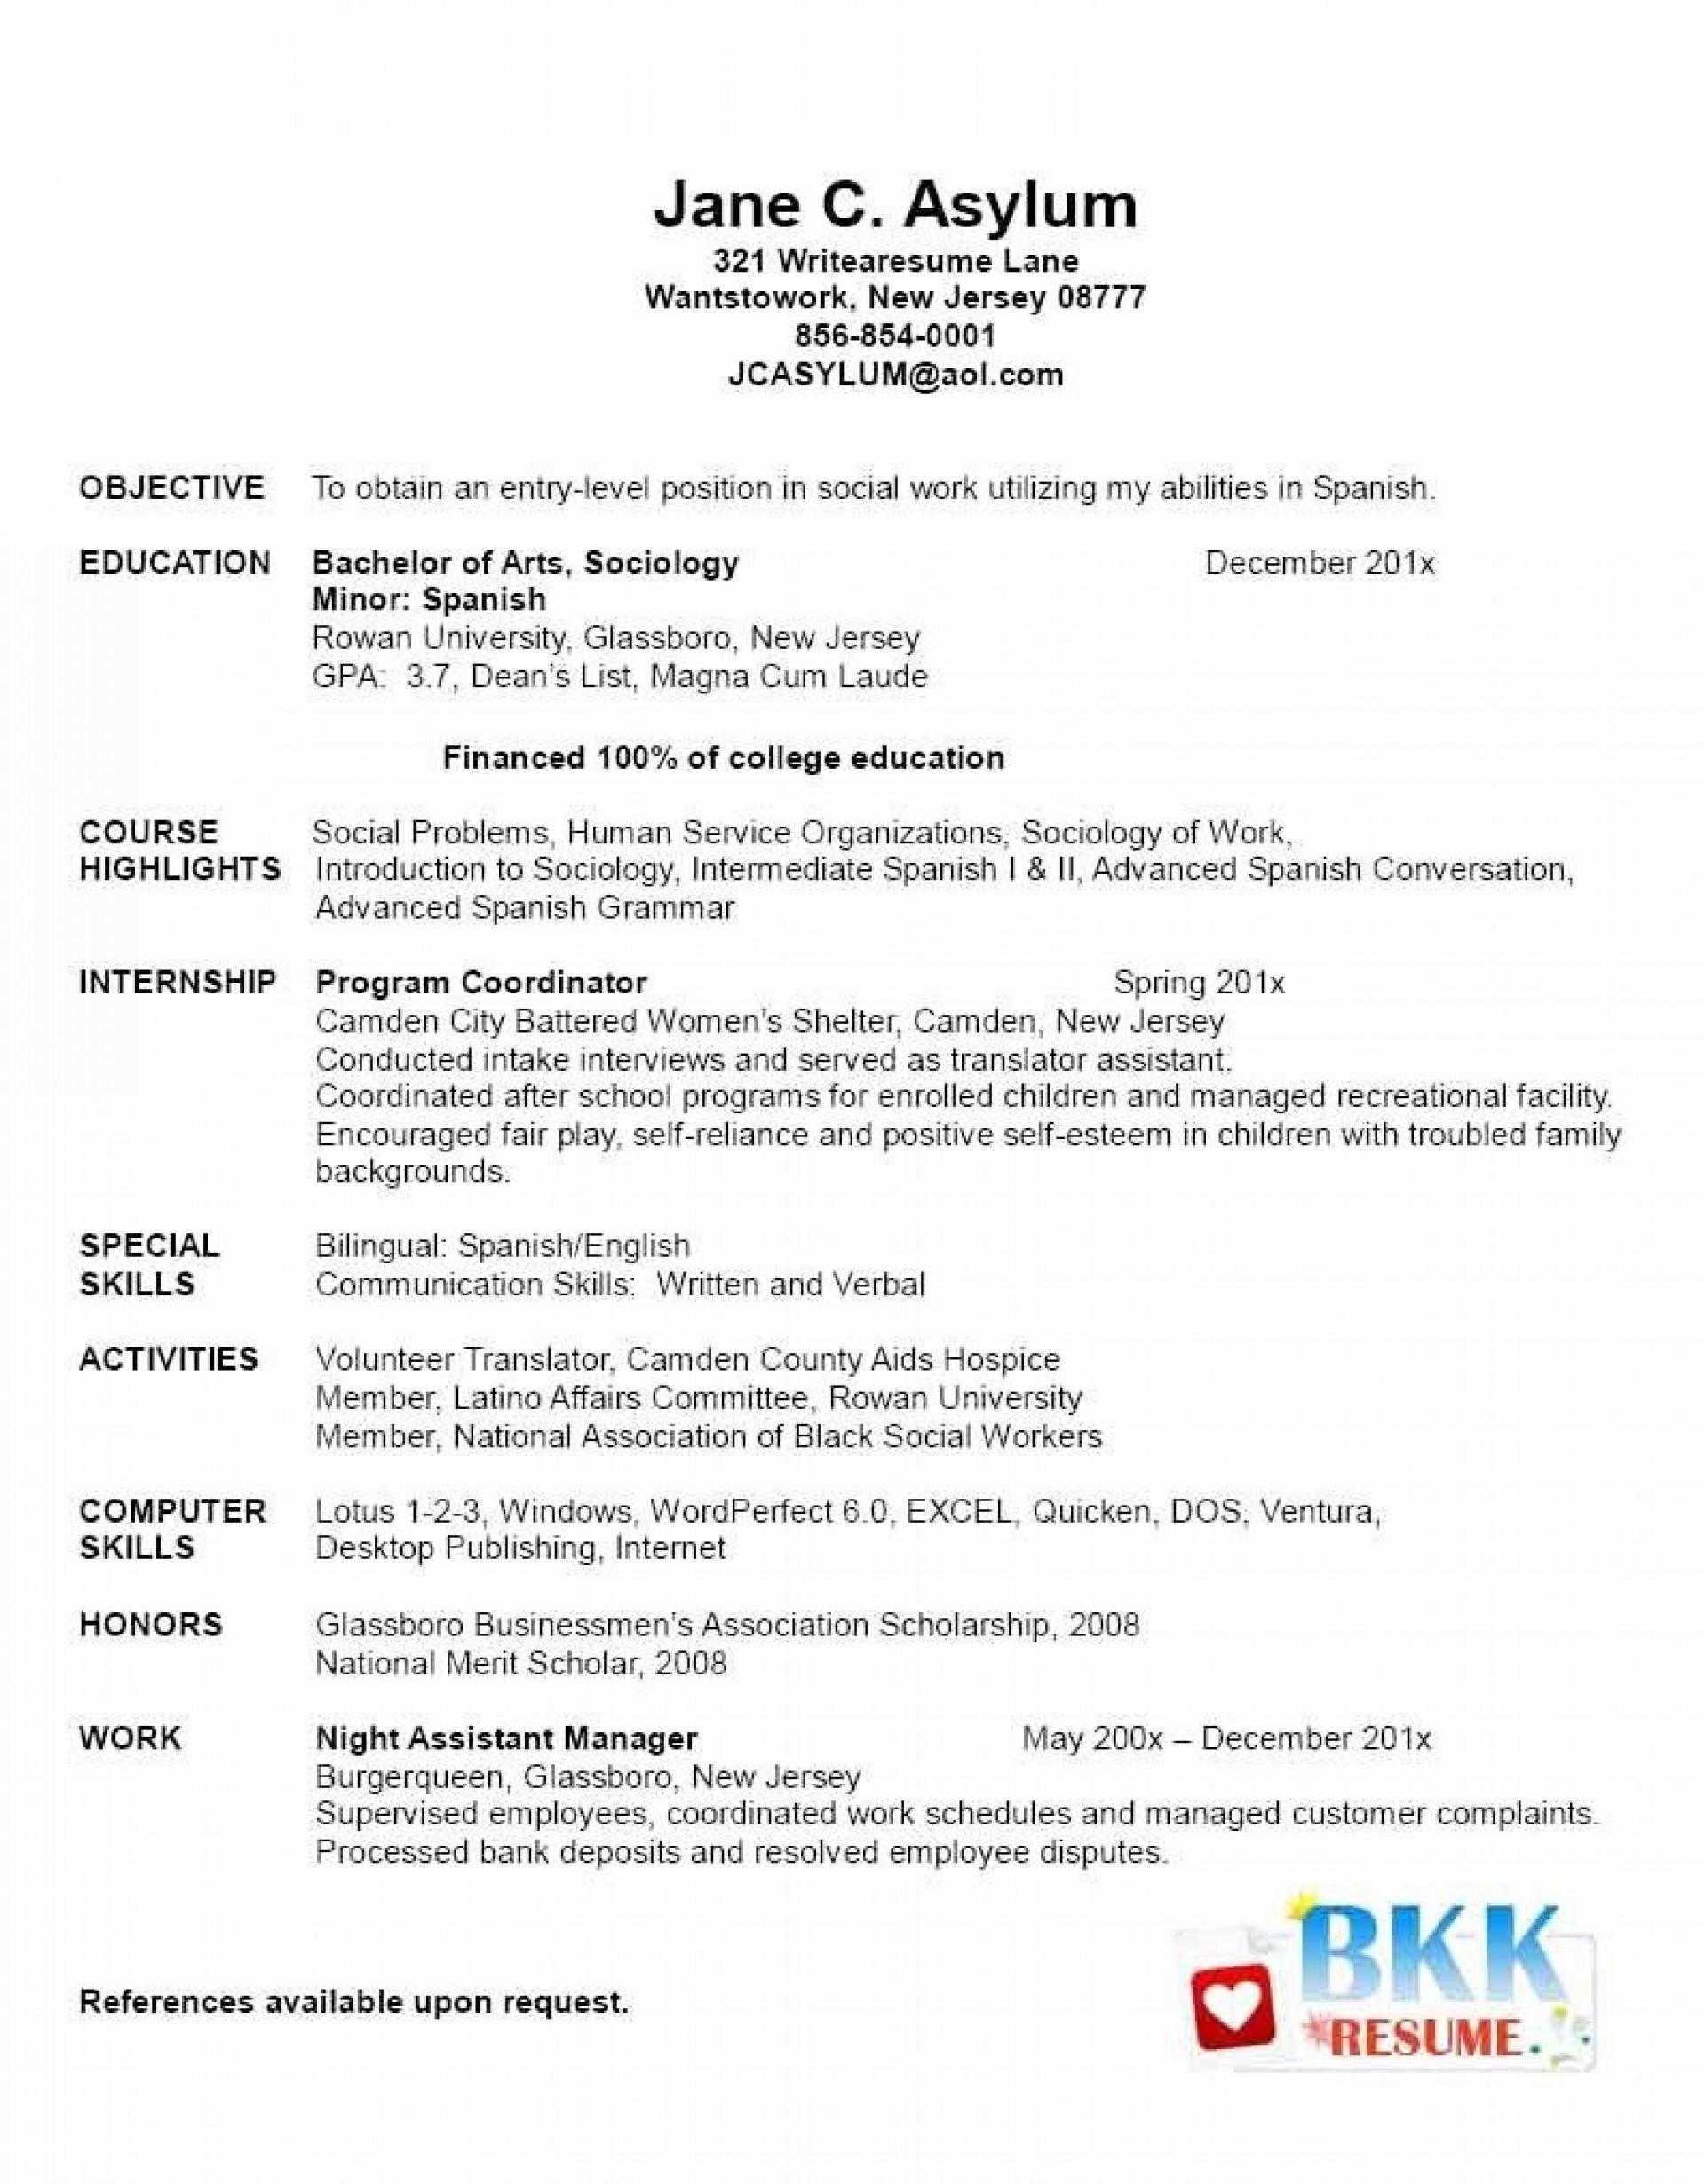 002 Incredible Grad School Resume Template Inspiration  Application Cv Graduate For Admission1920